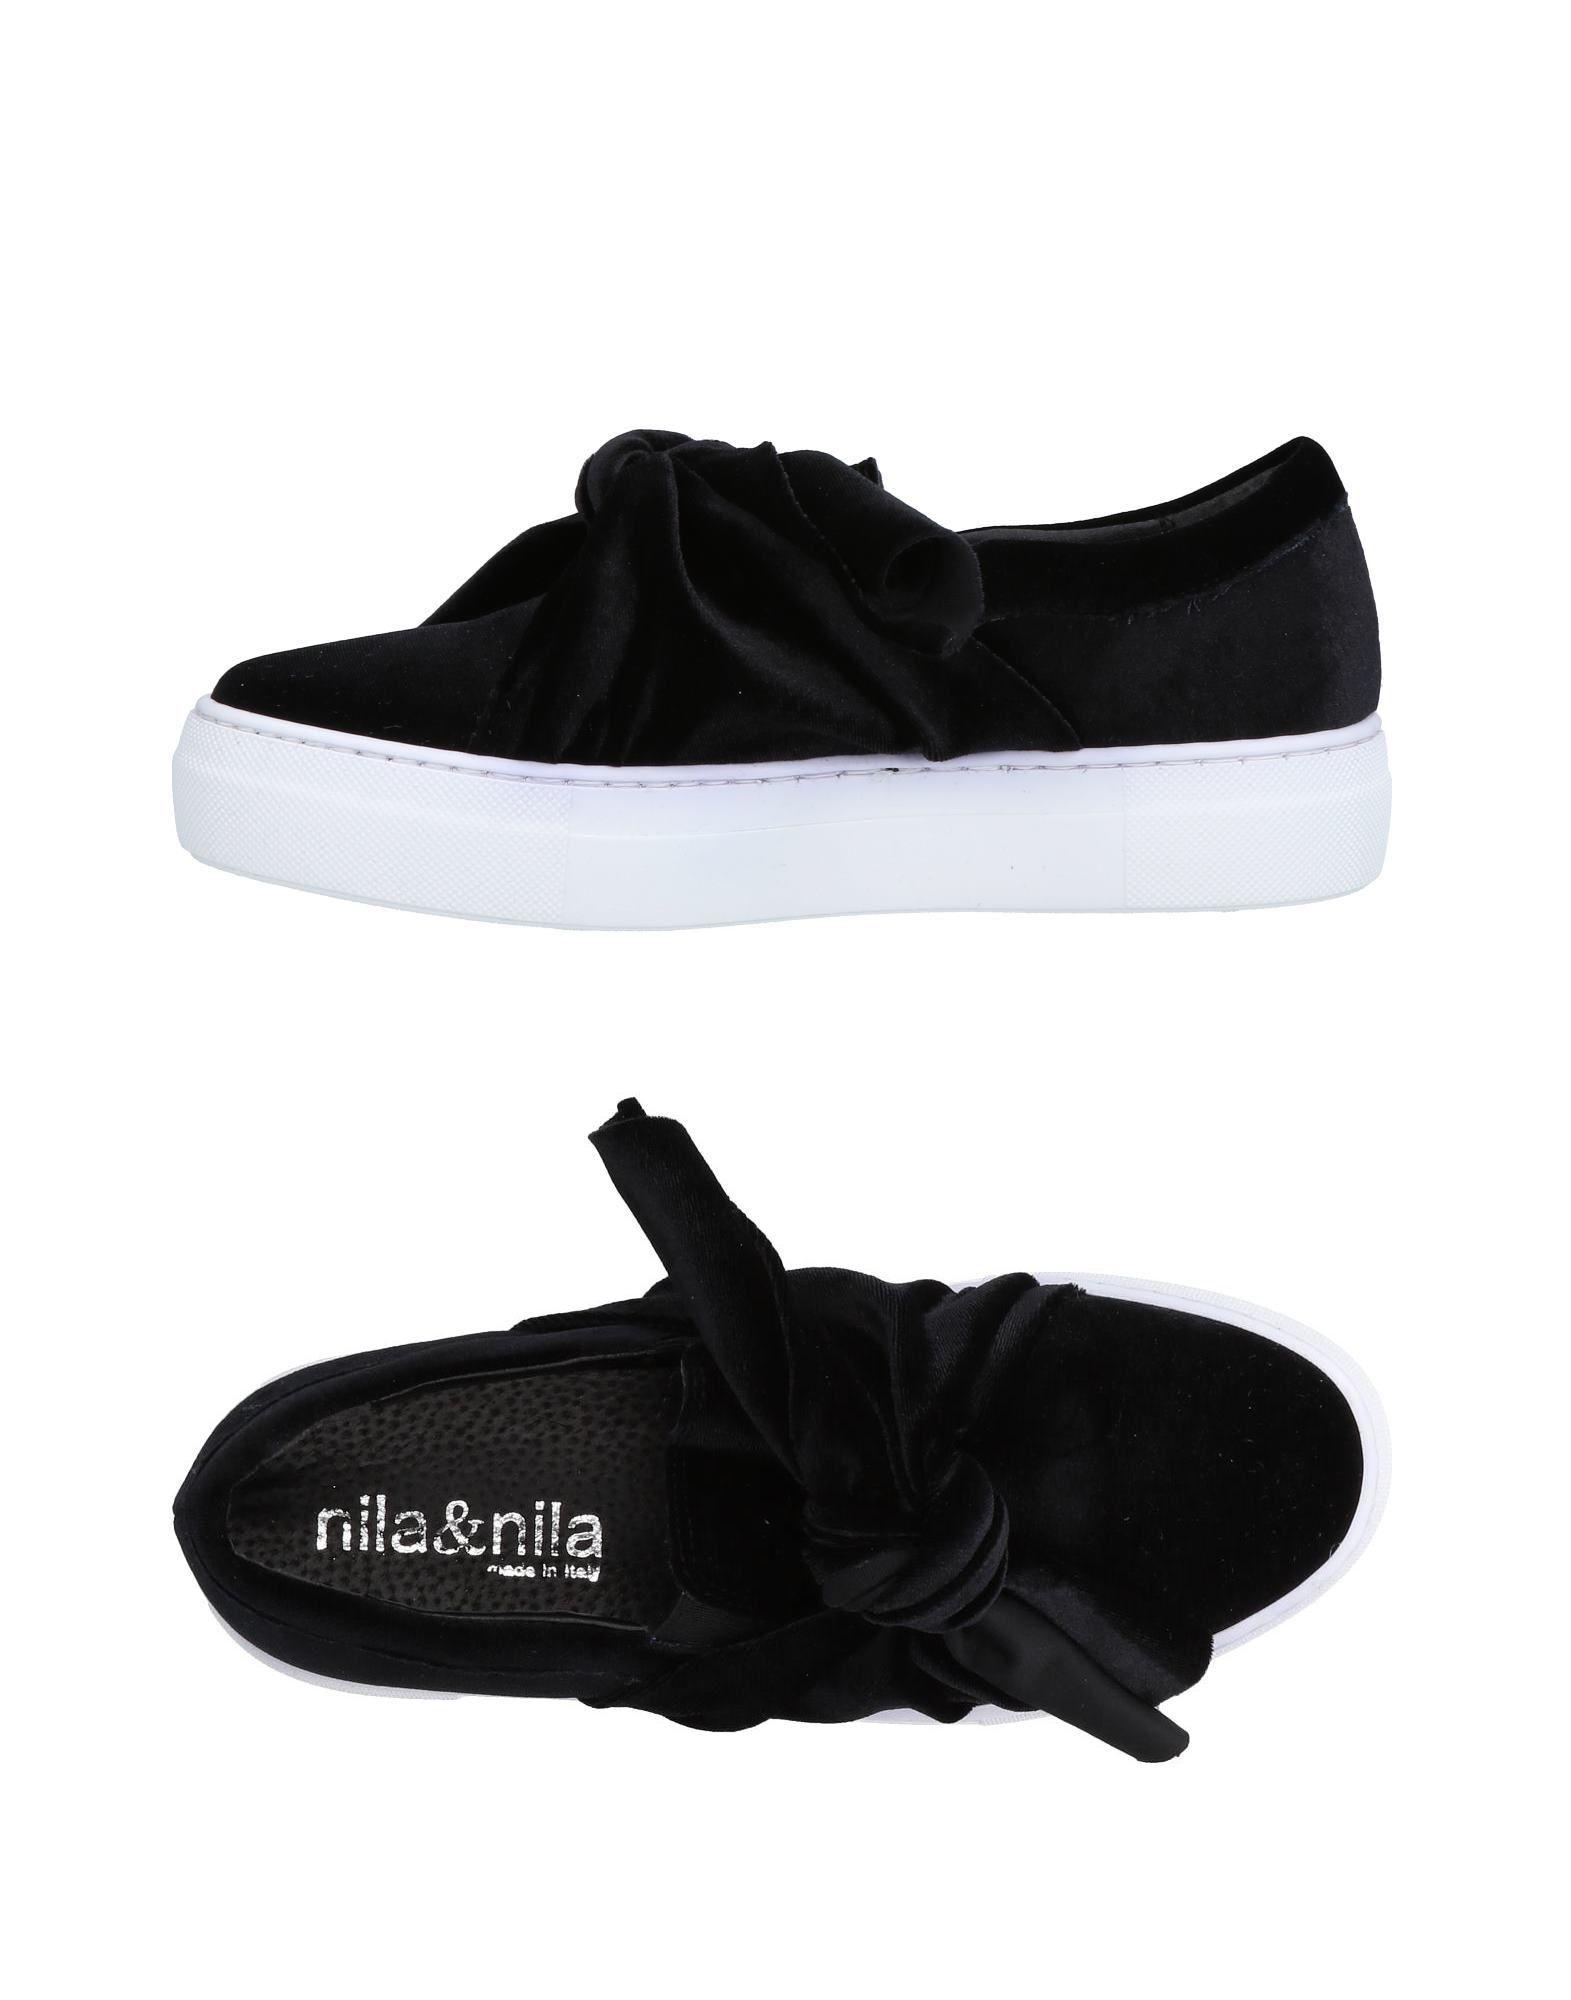 Nila & Nila Sneakers Damen  11474038IS Gute Qualität beliebte Schuhe